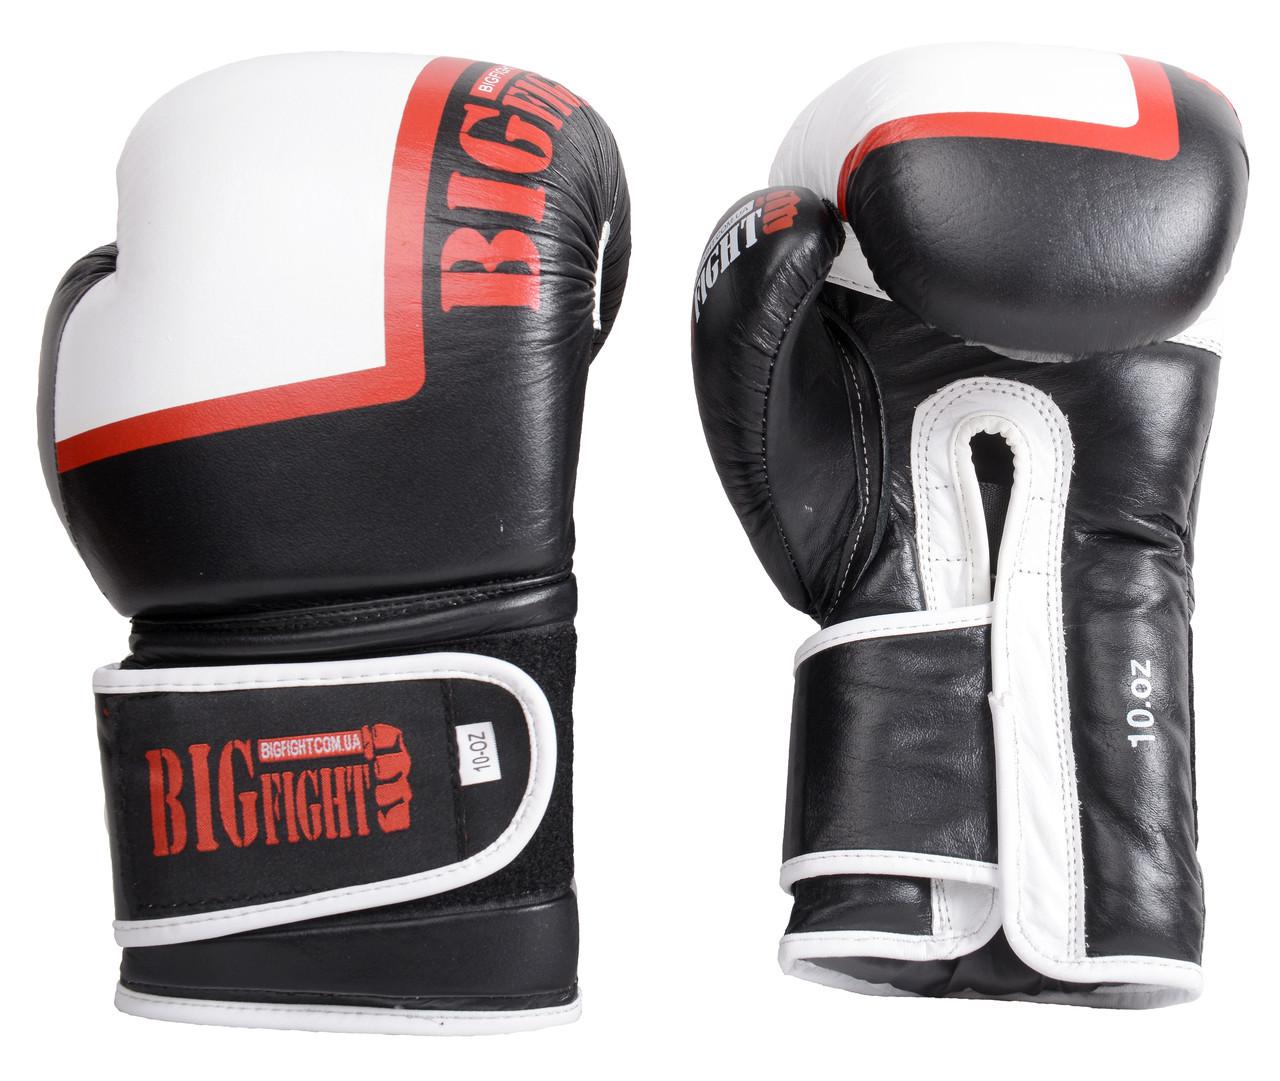 Боксерские перчатки  BigFight  черно-белые 10ун  кожа